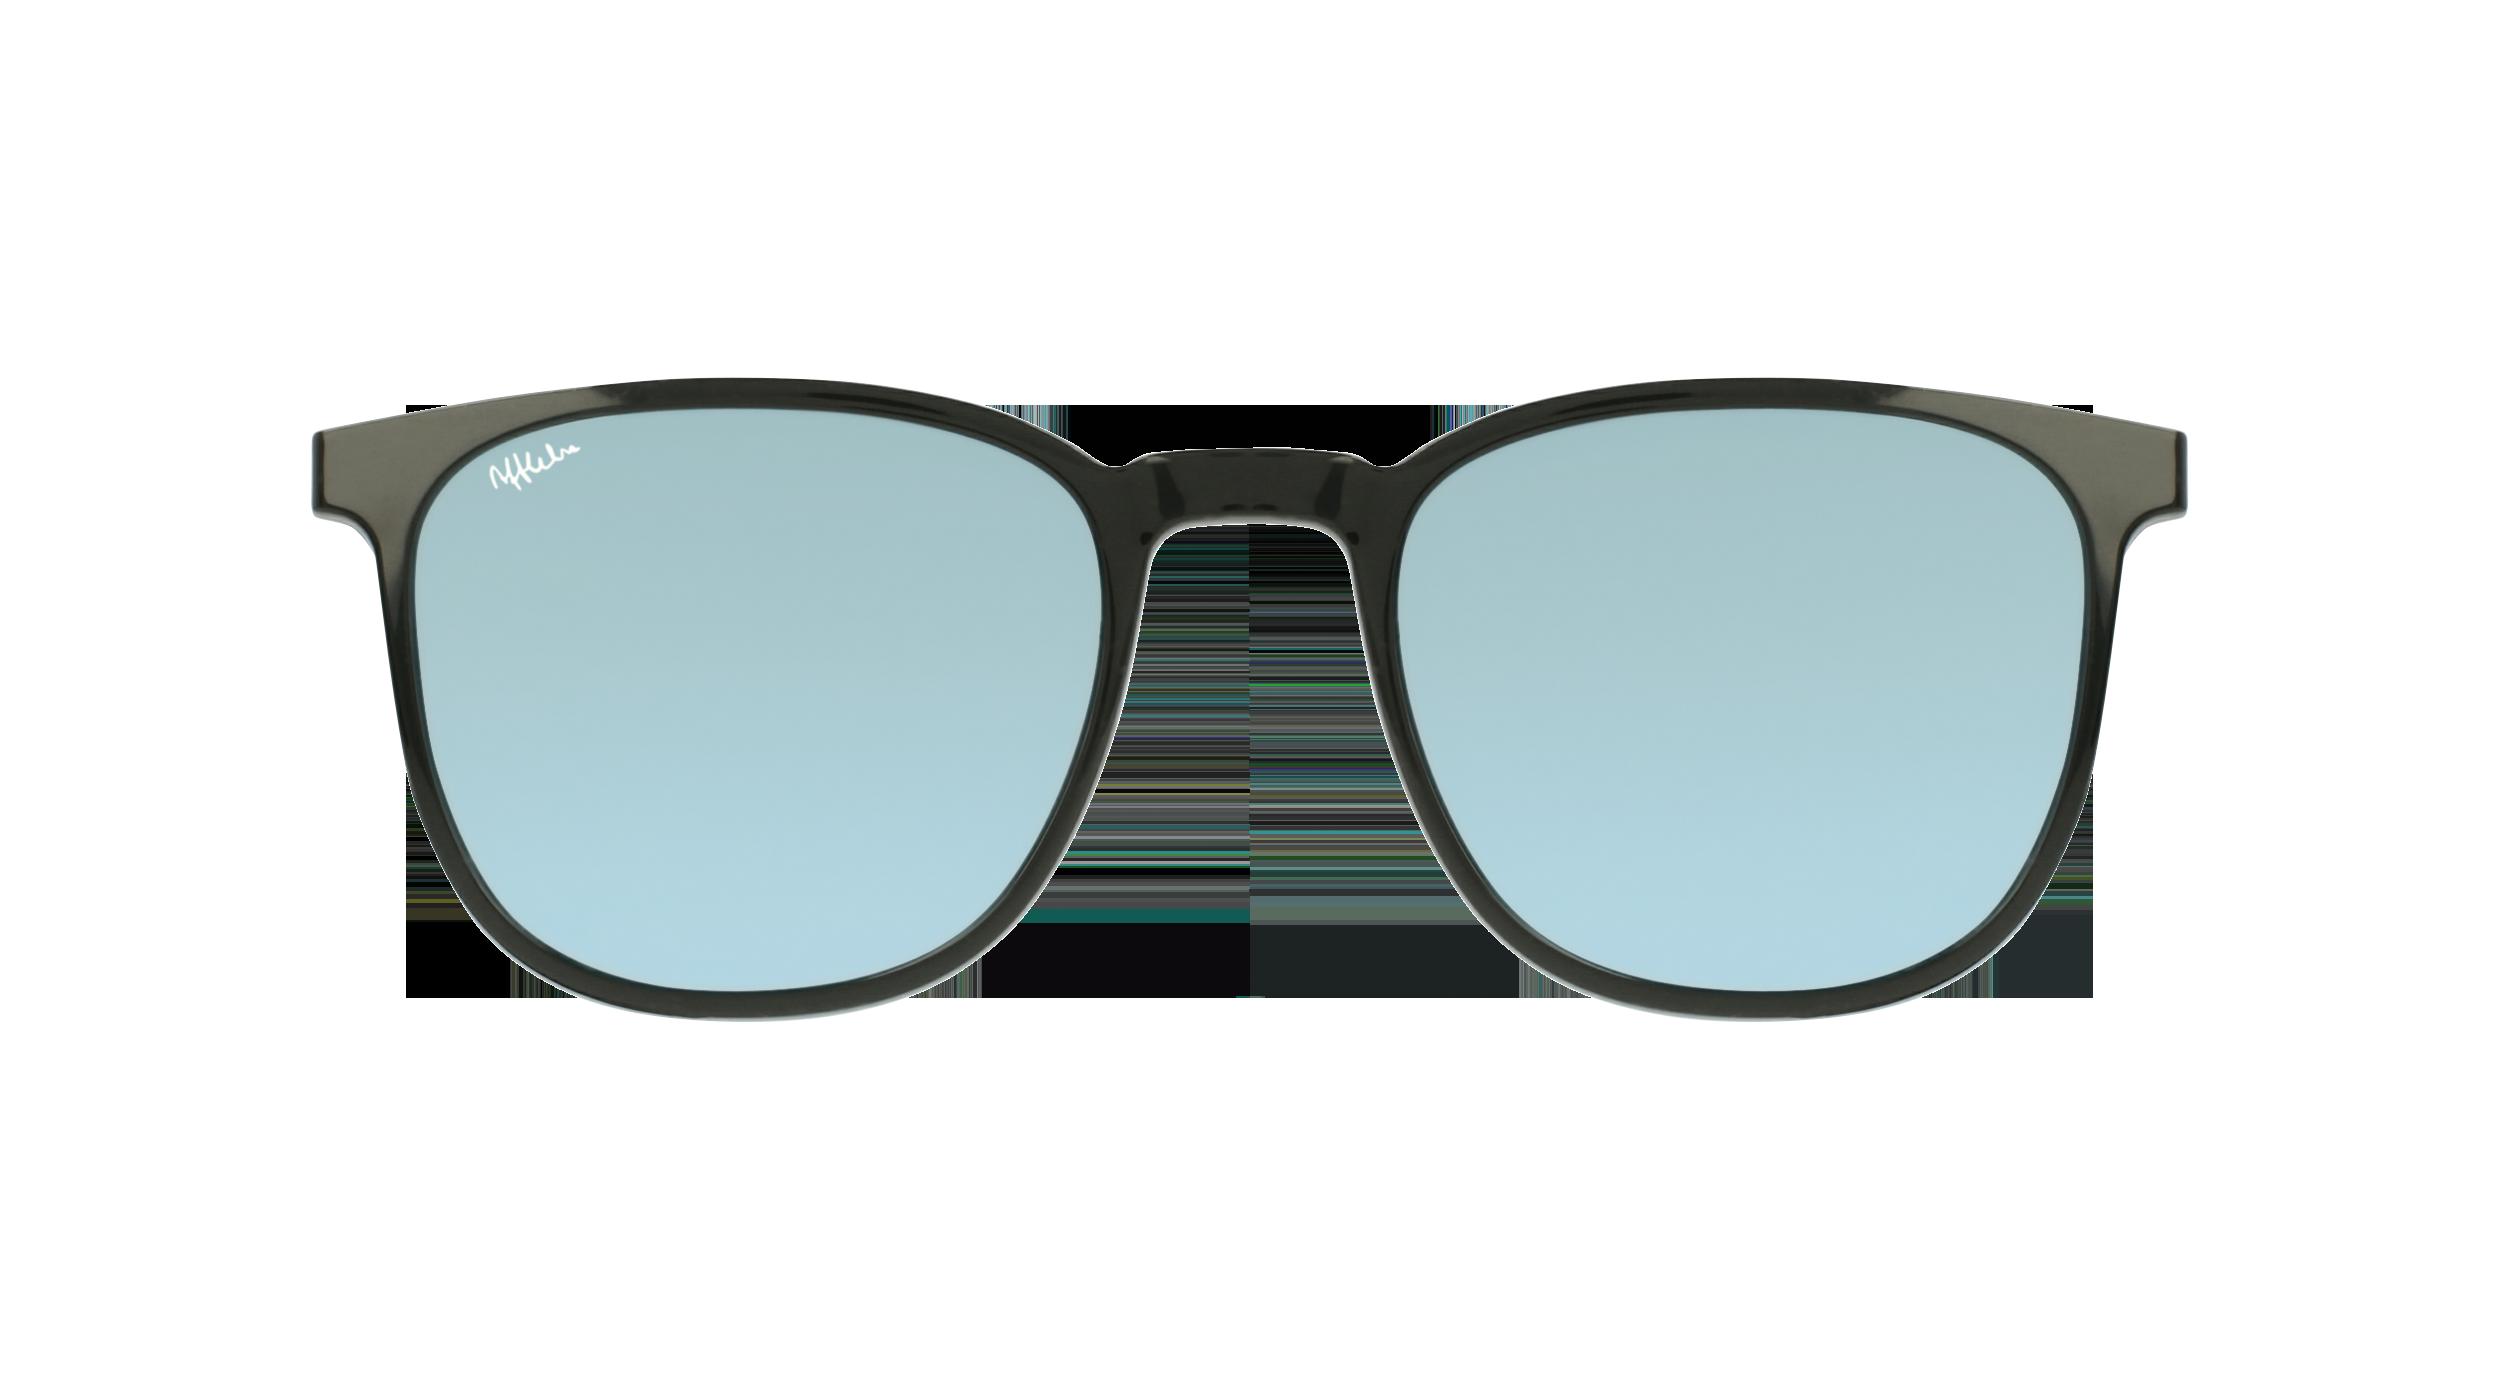 afflelou/france/products/smart_clip/clips_glasses/07630036457399.png